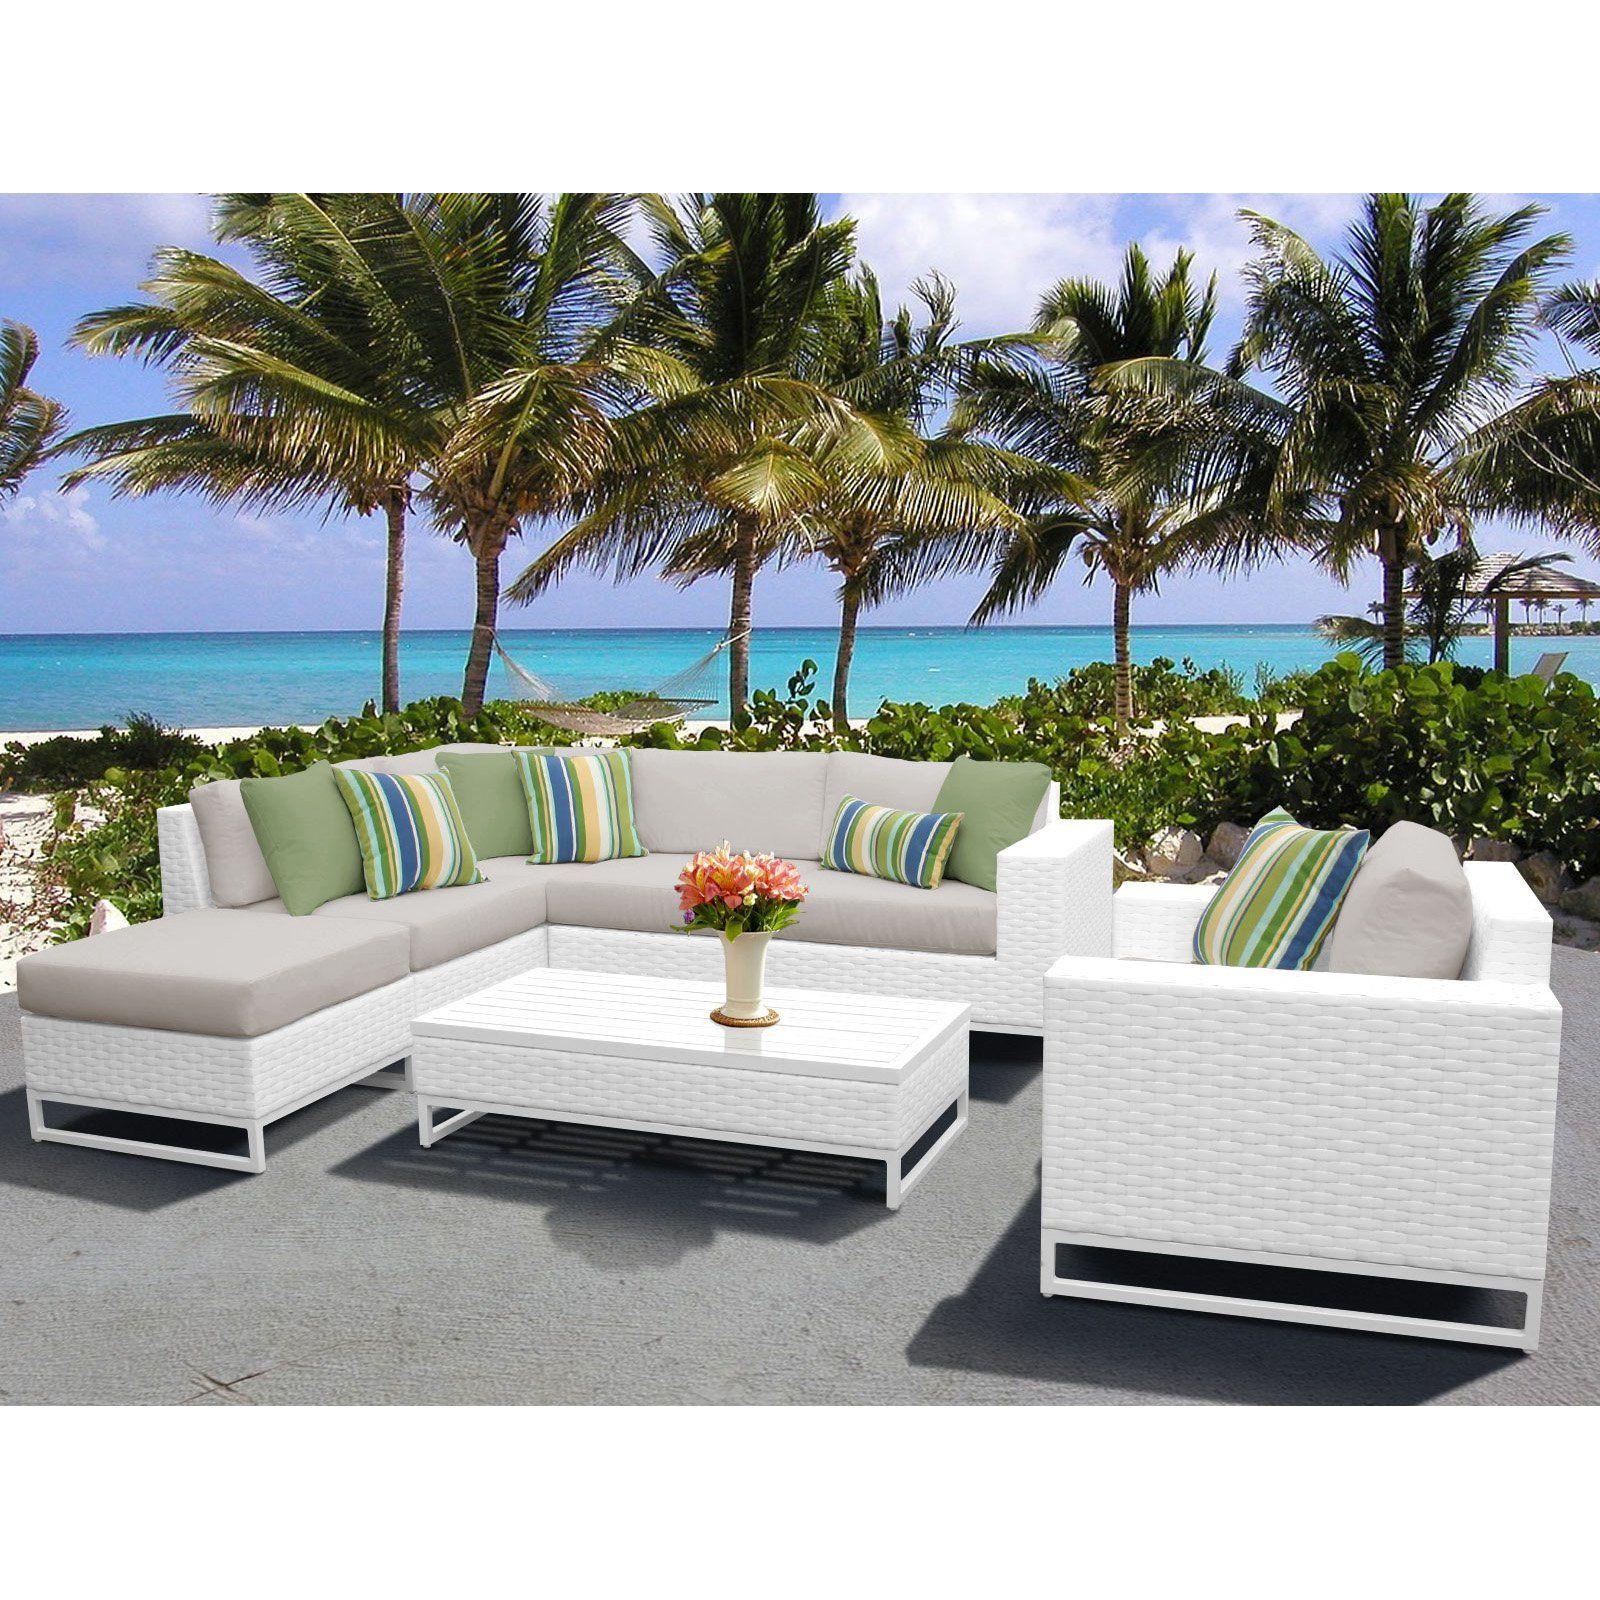 Outdoor Tk Classics Miami Wicker 7 Piece Sectional Patio